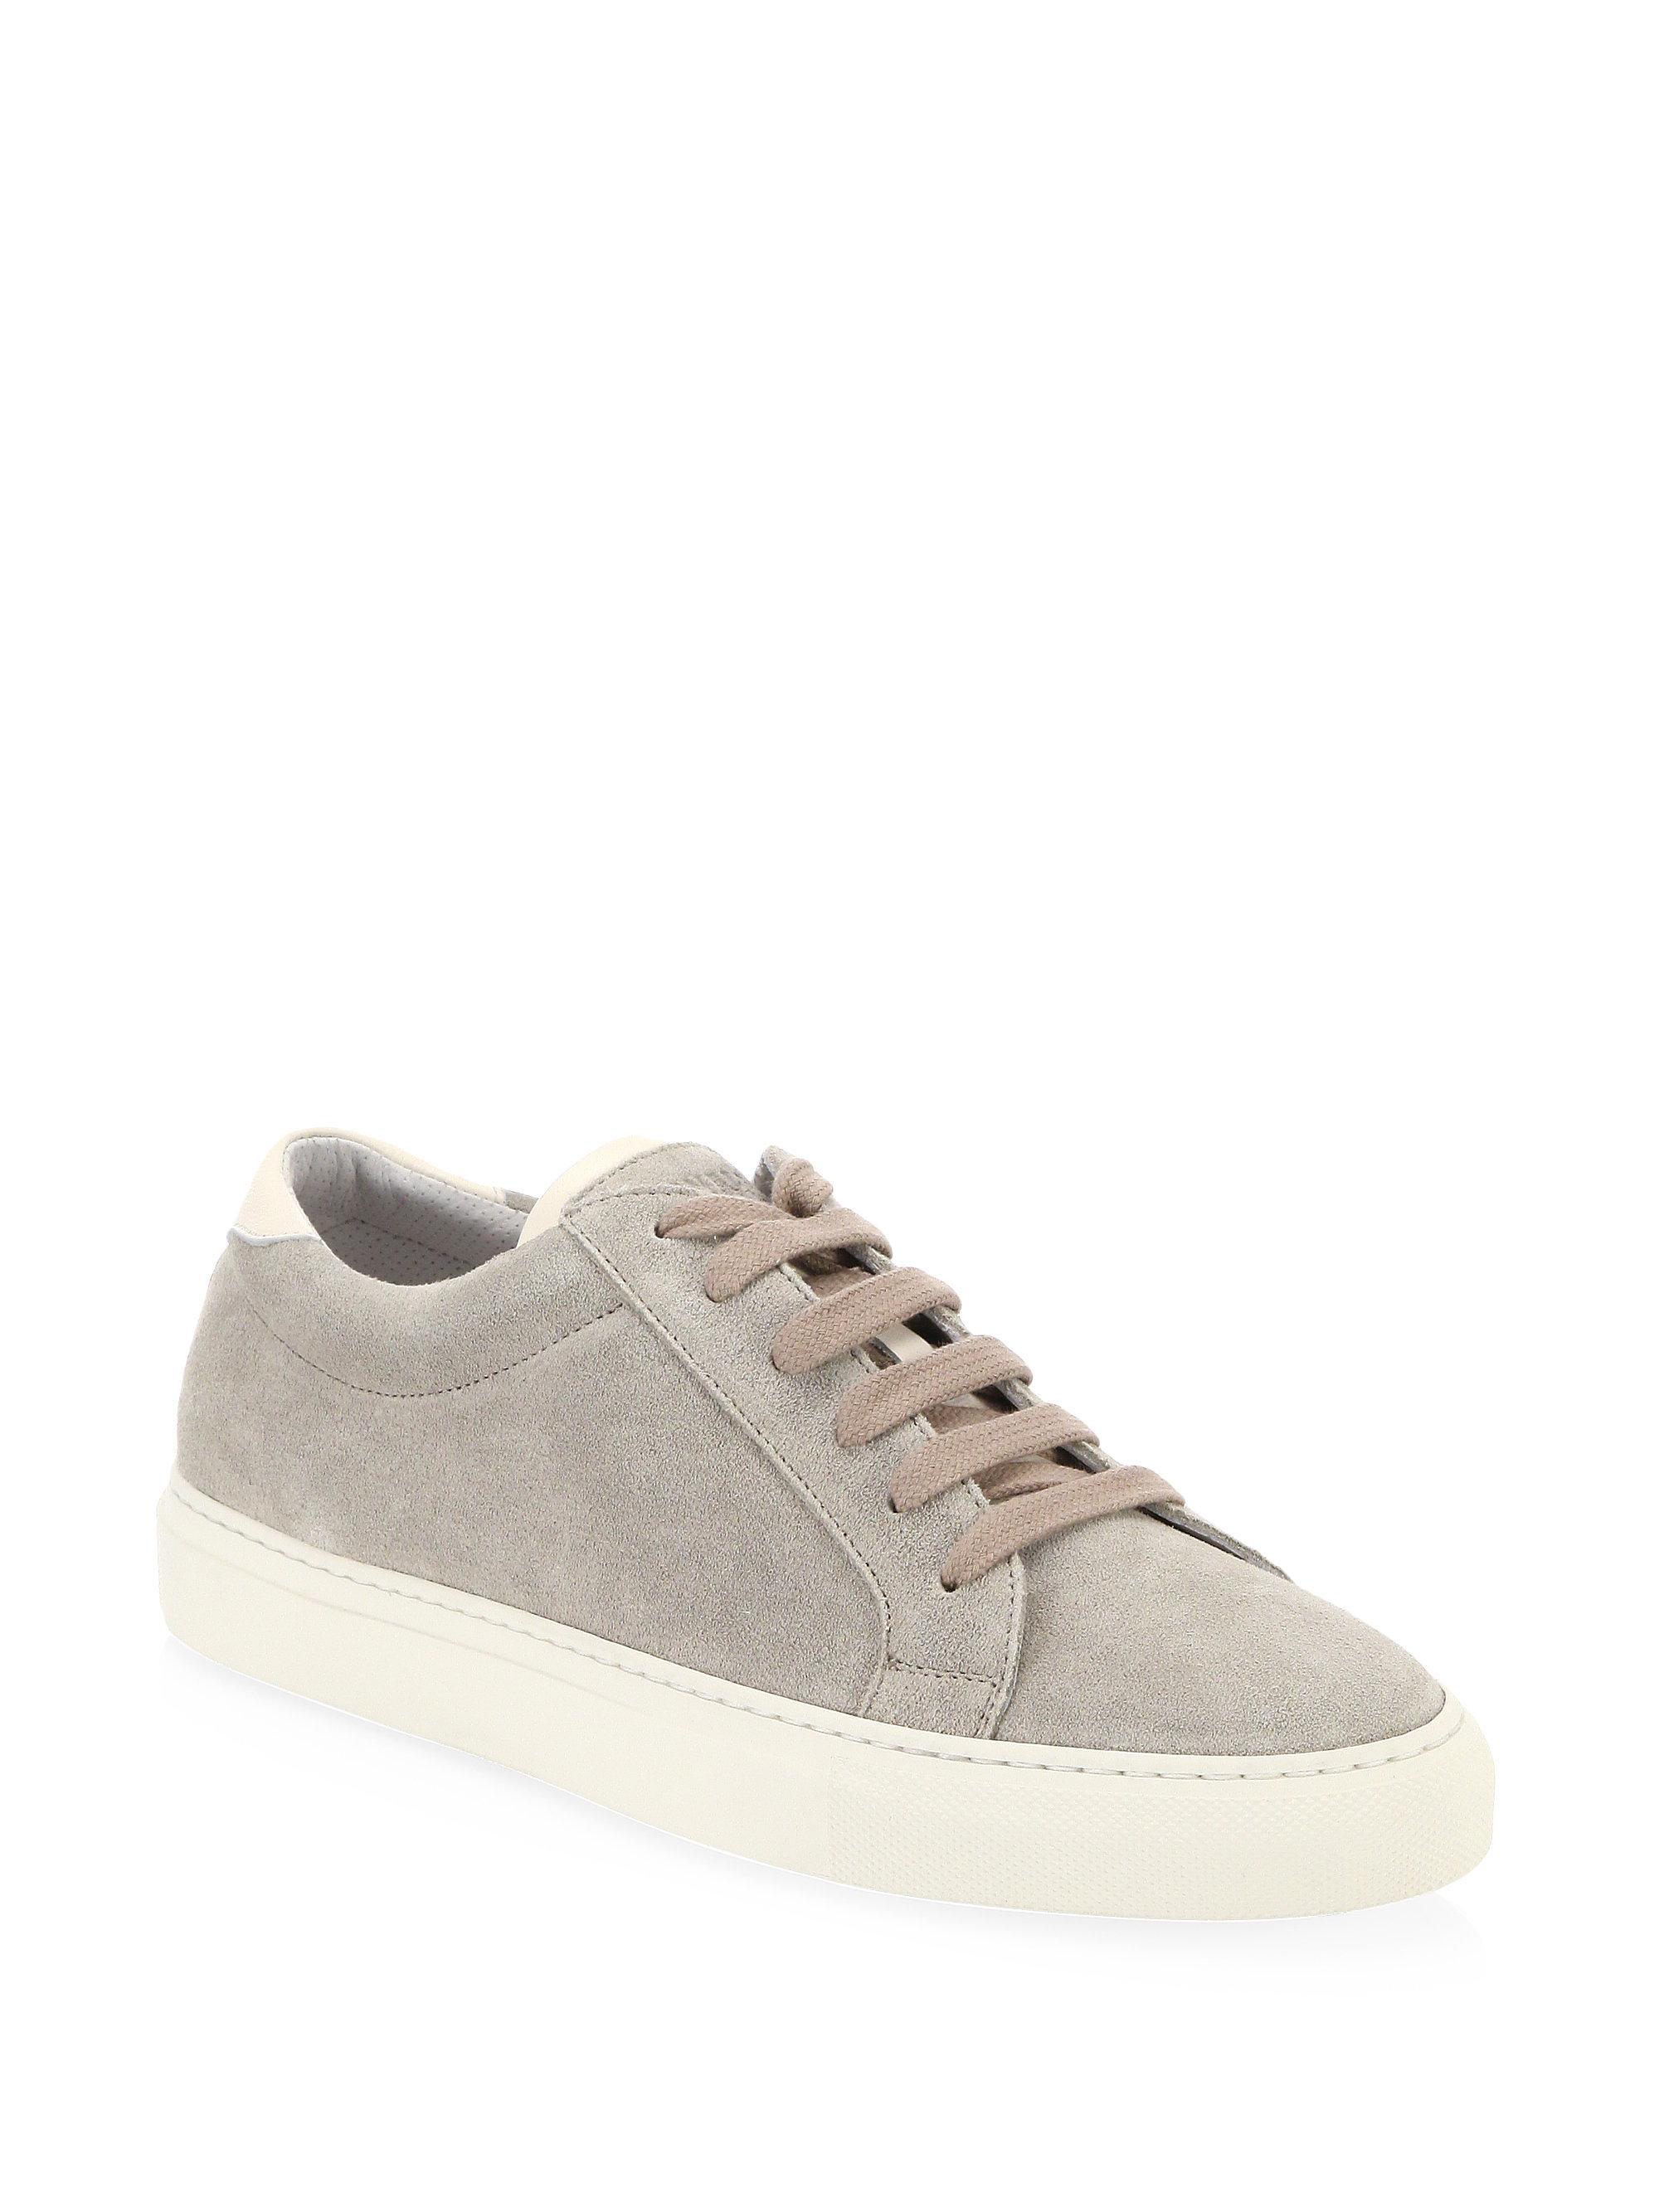 Velvet and suede sneakers Brunello Cucinelli KVXA2cHu9f